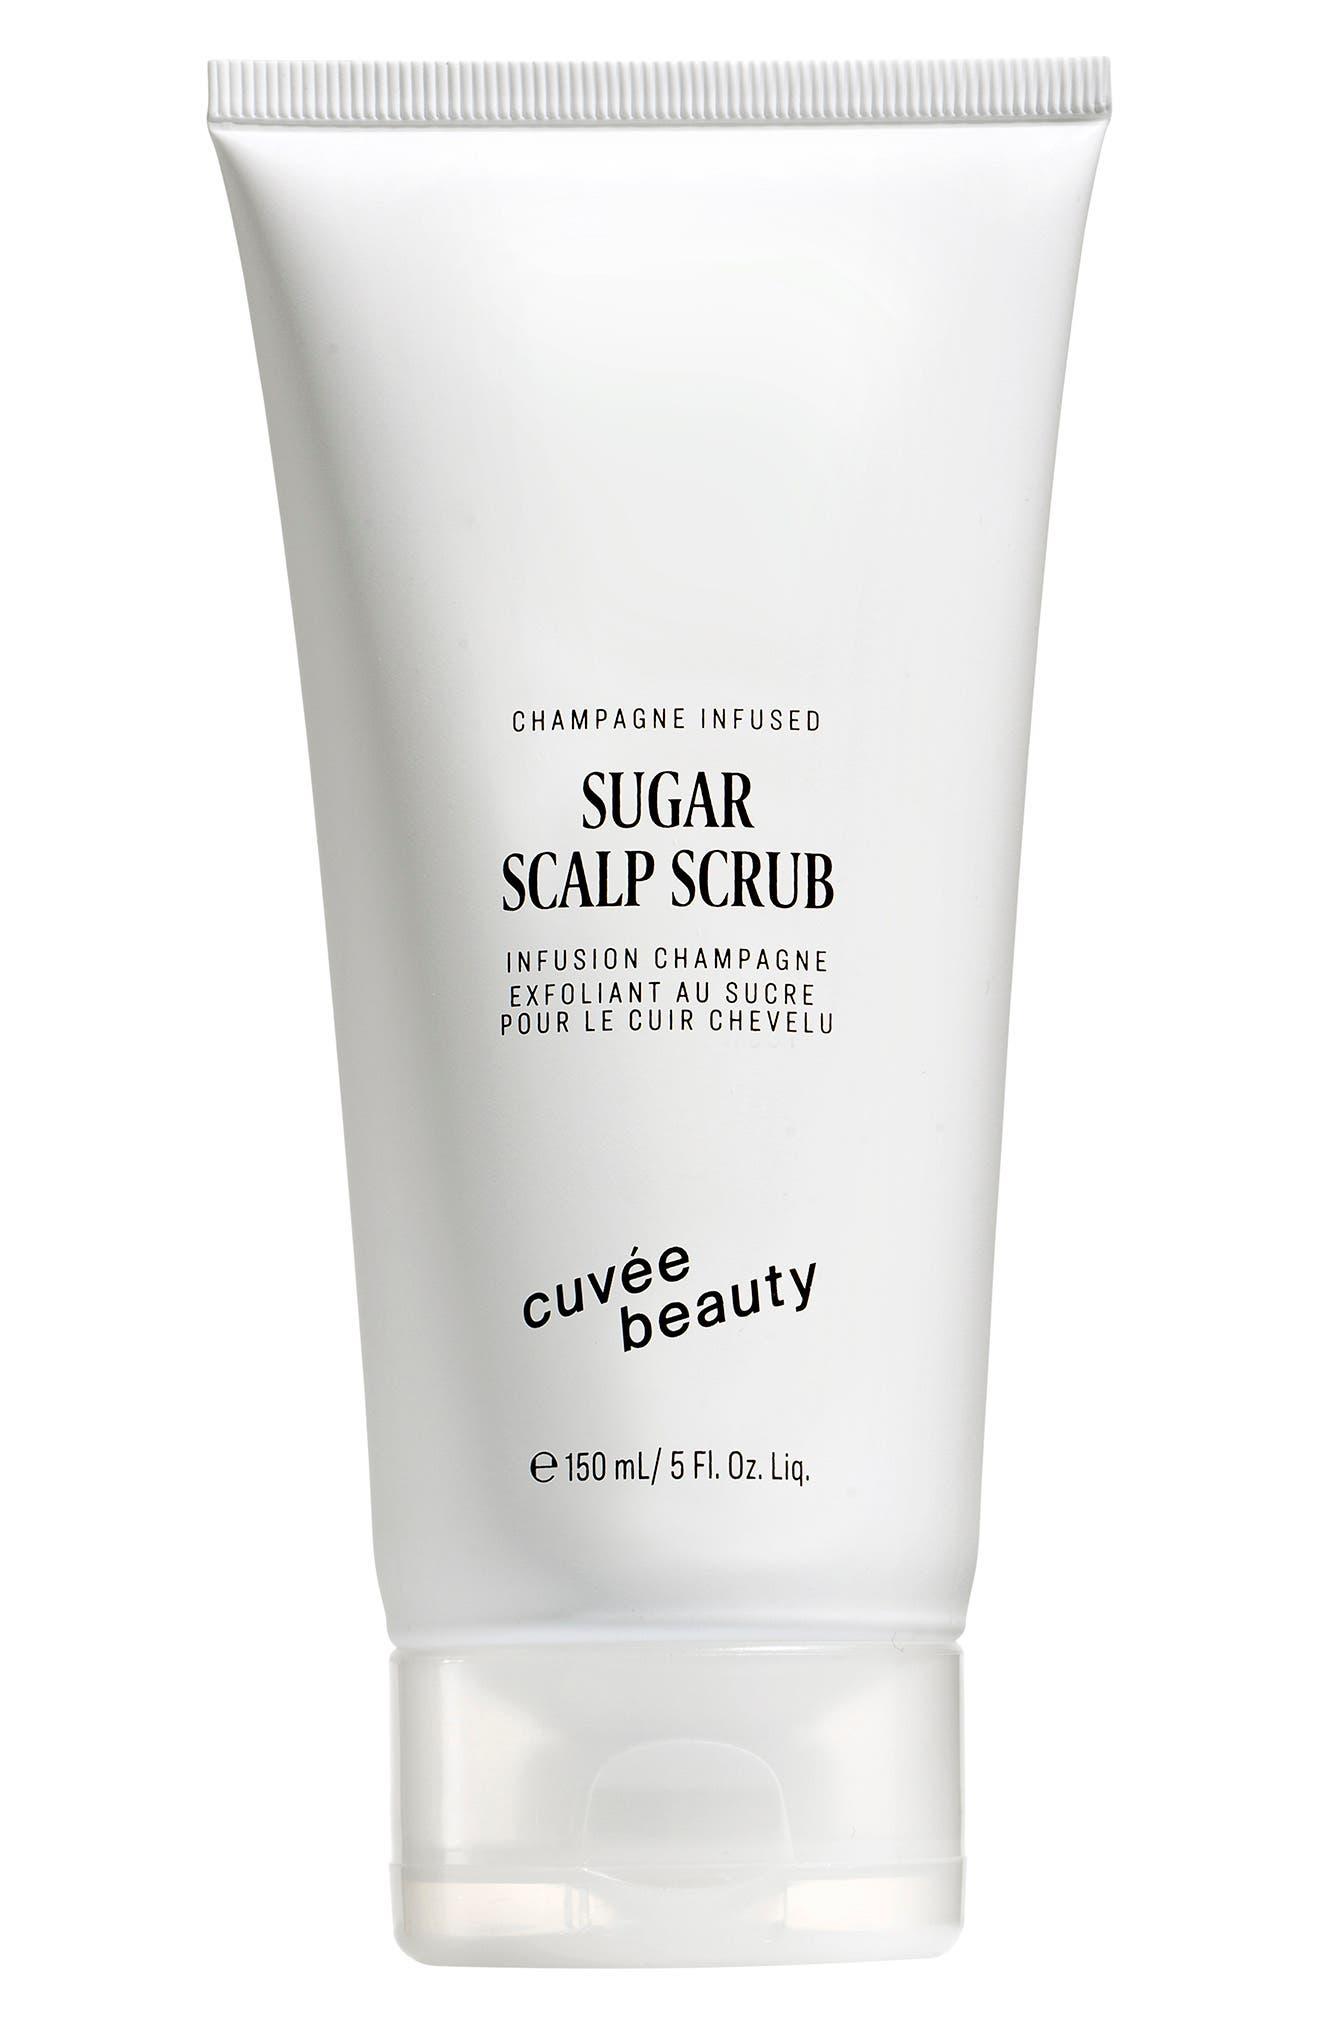 Sugar Scalp Scrub